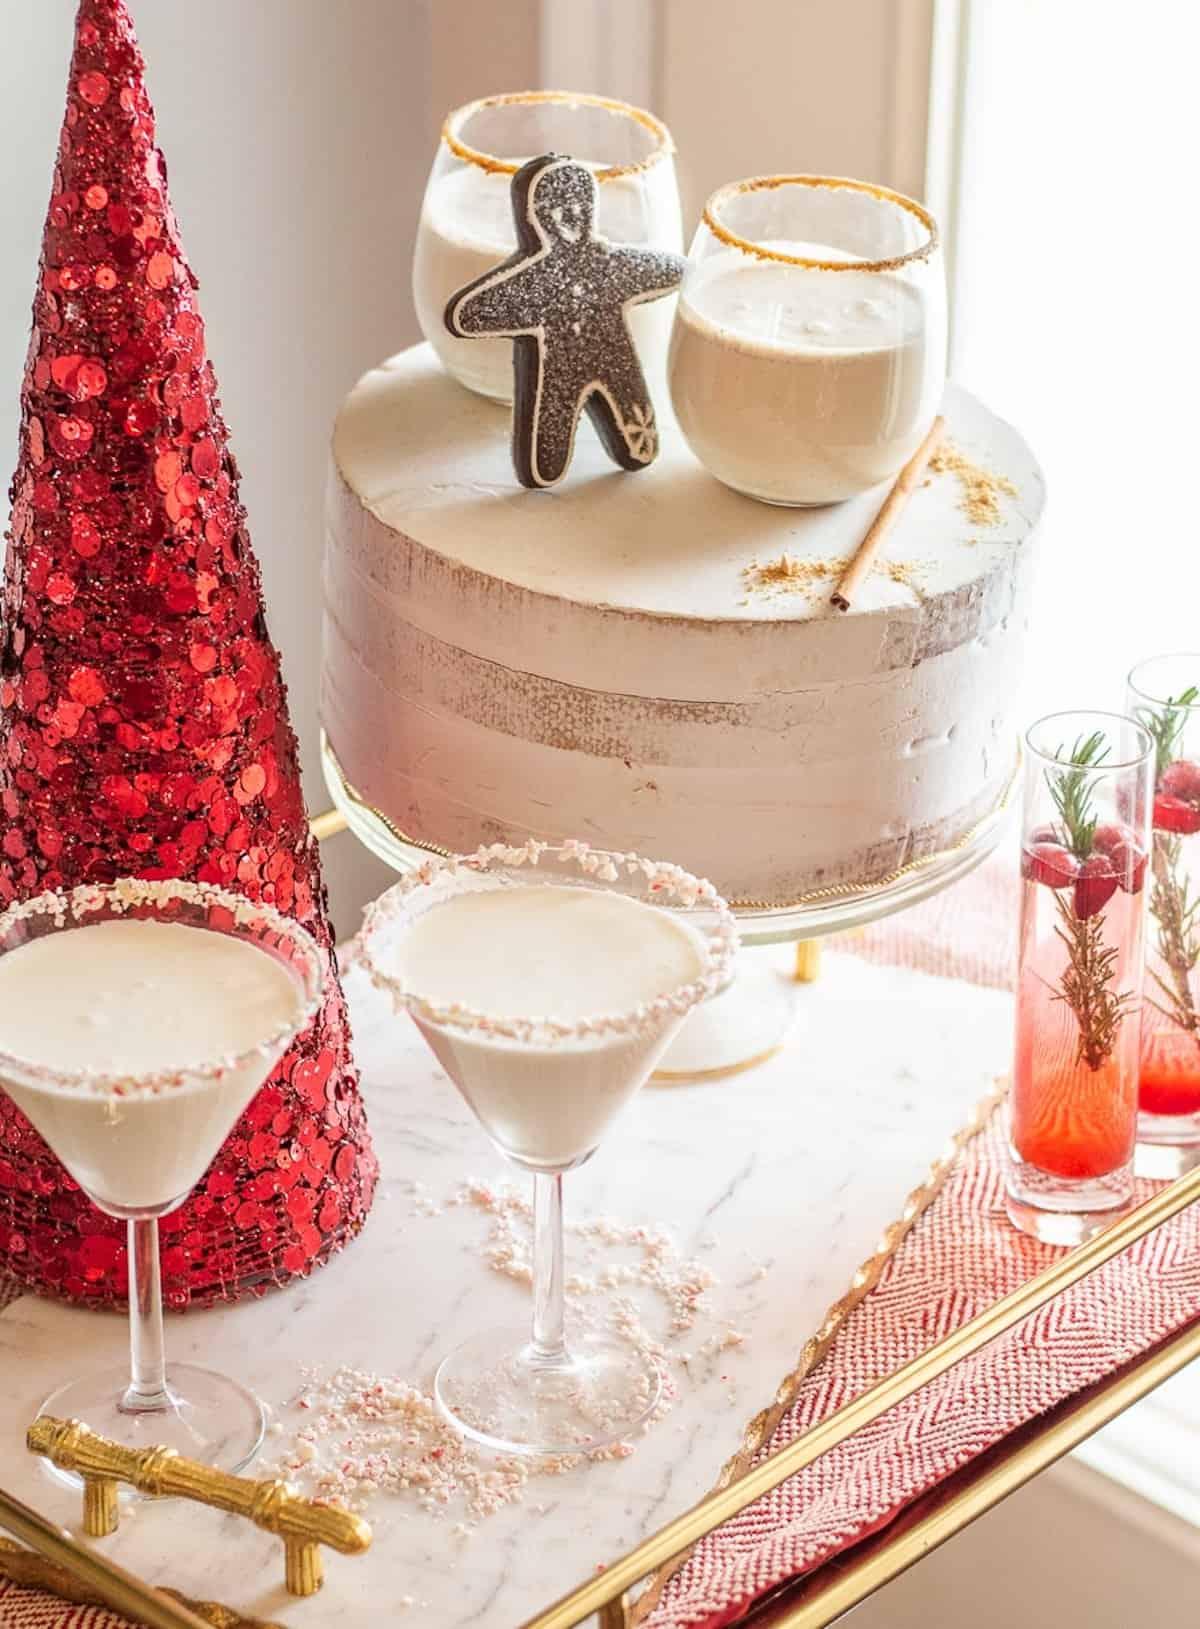 Candy Cane Martini Christmas Mocktails on a bar cart